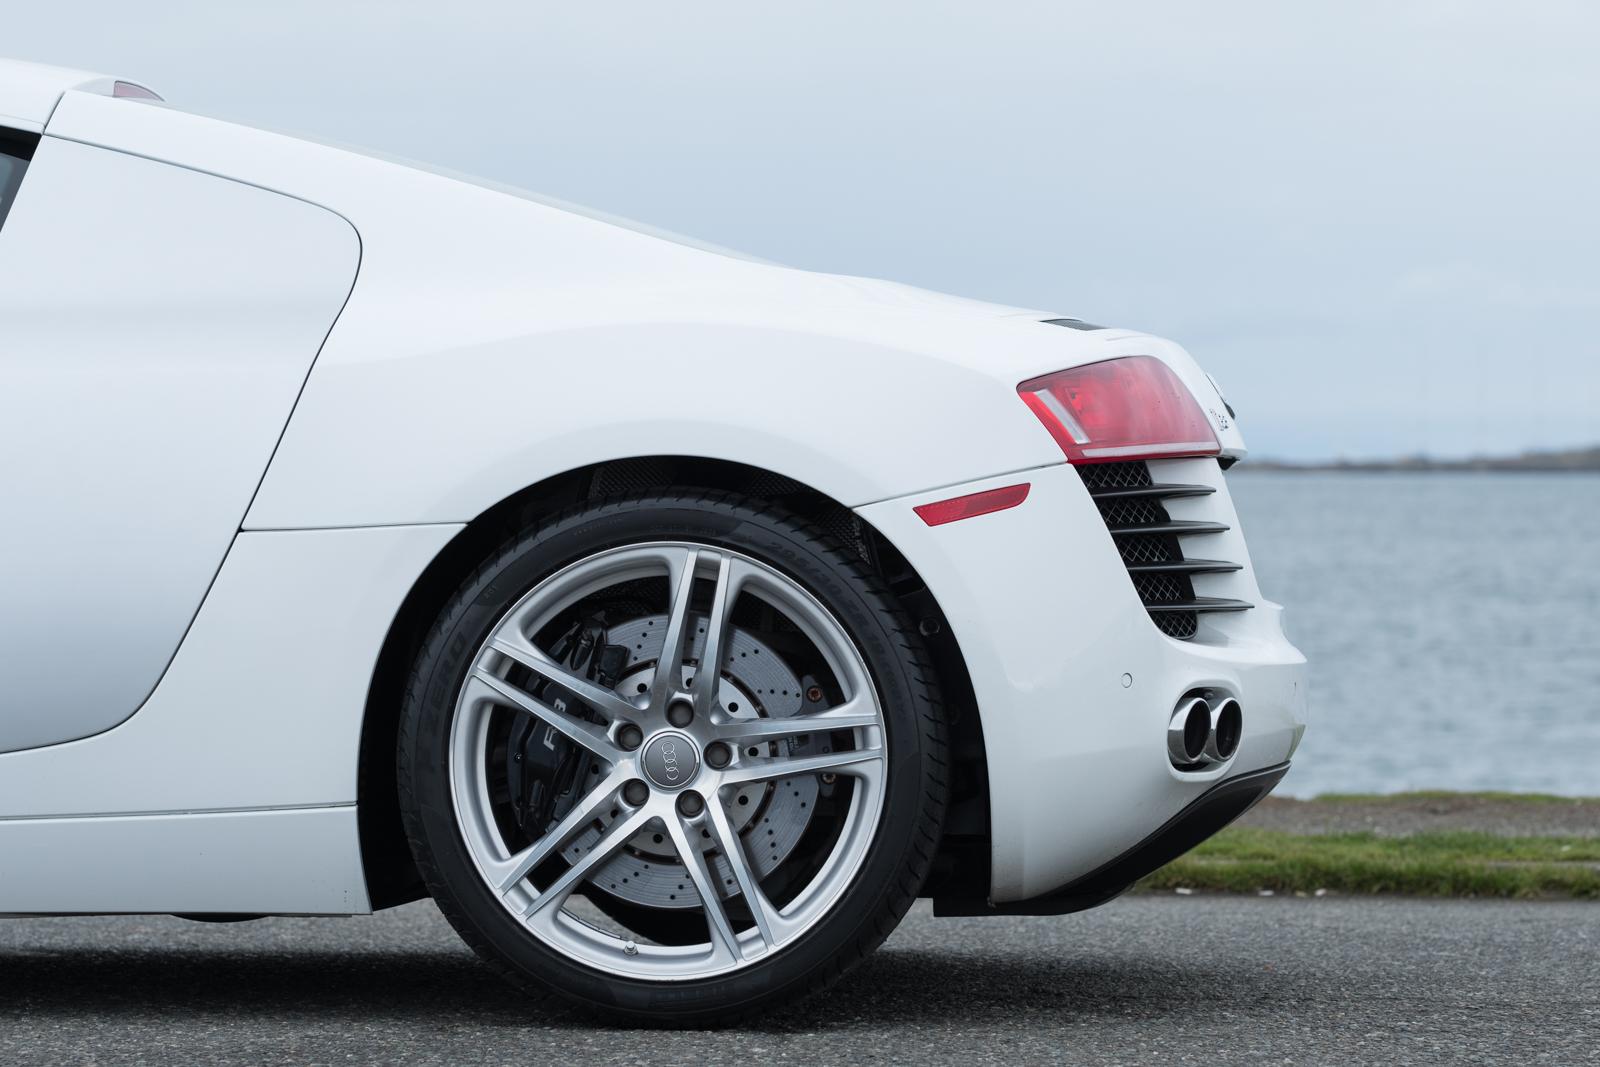 2008 Audi R8 V8 Coupe for sale